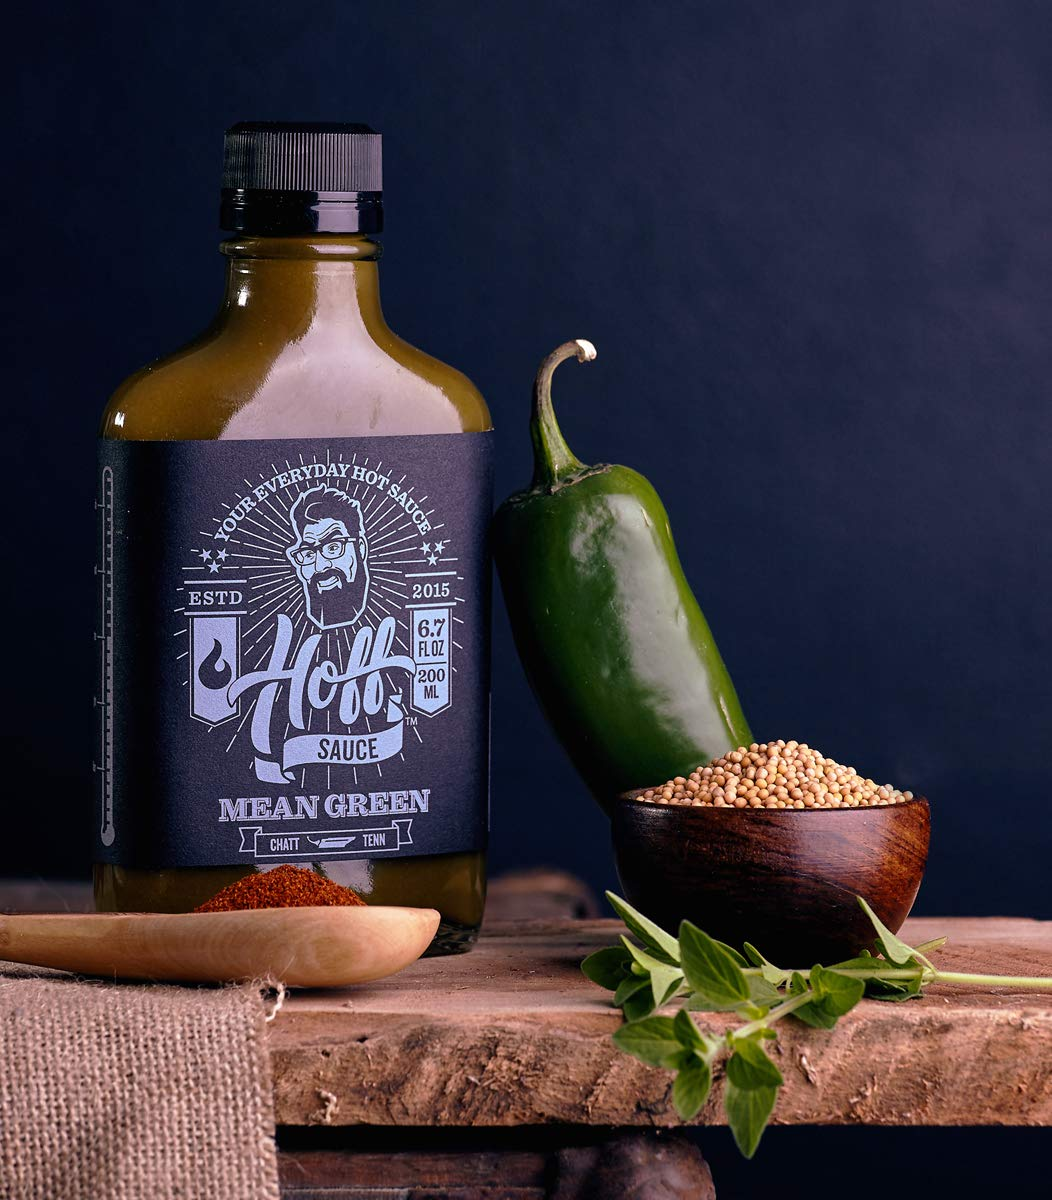 Mean Green - Hoff's Green Jalapeno Hot Sauce - 6.7oz Flask